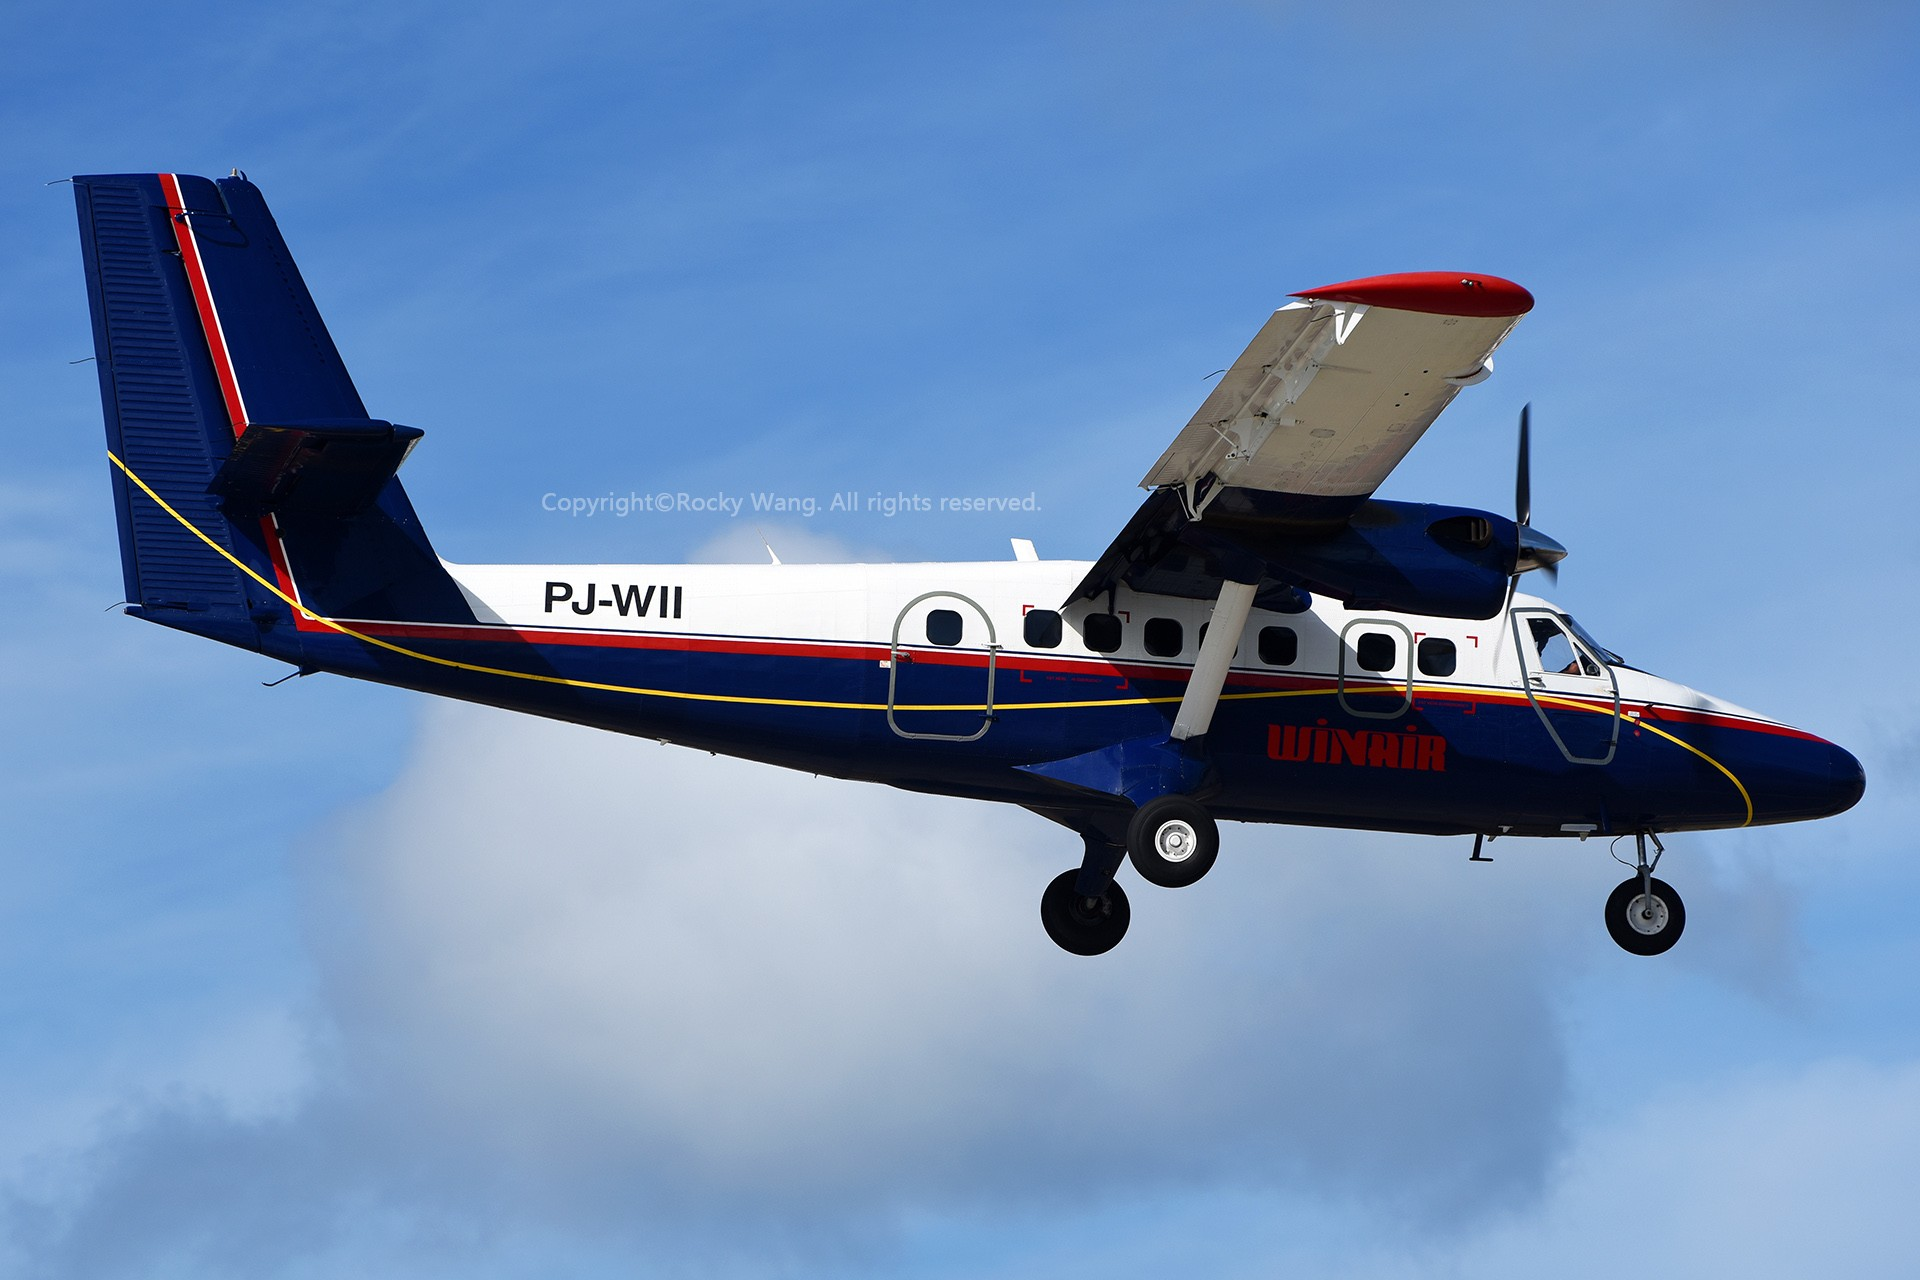 Re:[原创]My endless Caribbean dream——圣马丁朱莉安娜公主机场拍机记 DE HAVILLAND CANADA DHC-6-300 TWIN OTTER PJ-WII 荷属安的列斯群岛朱利安娜公主机场